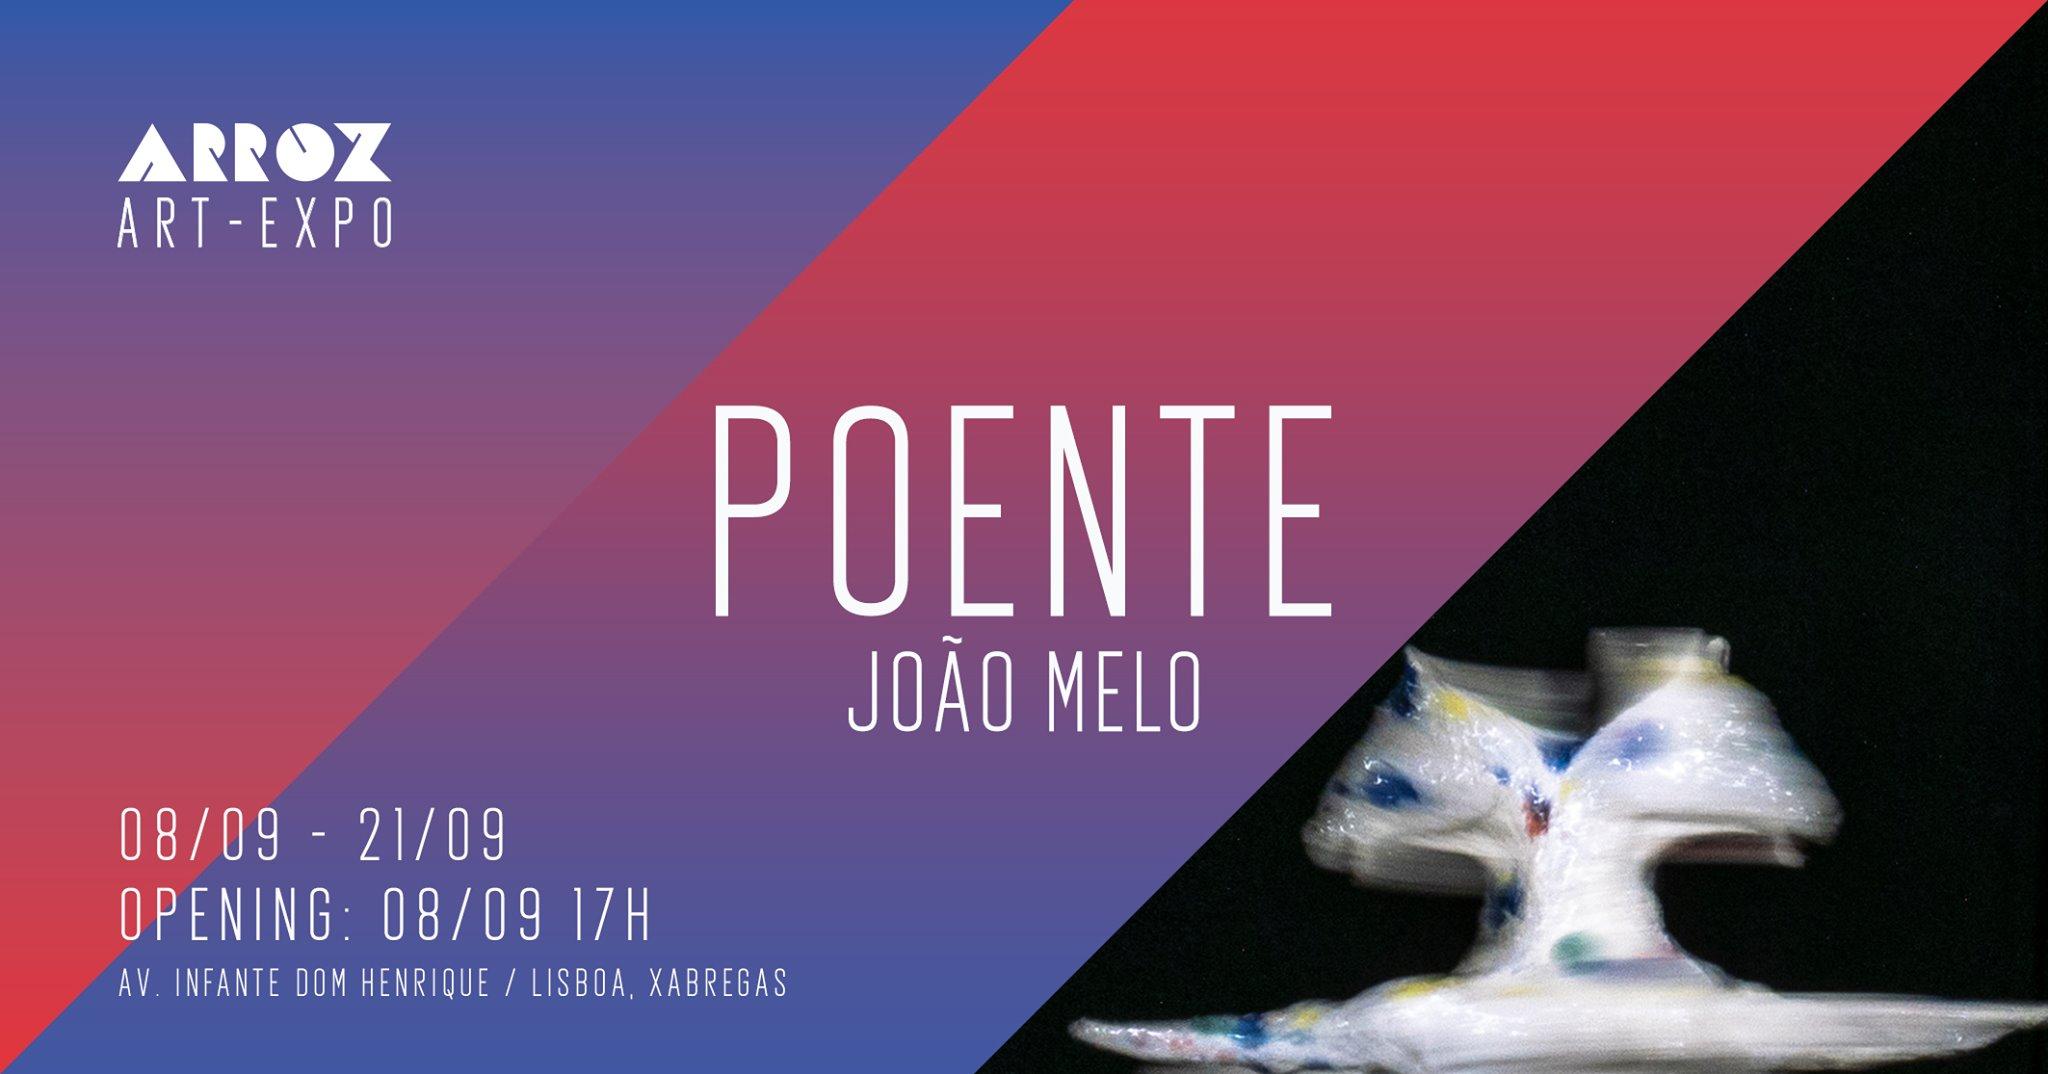 Expo: Poente - João Melo